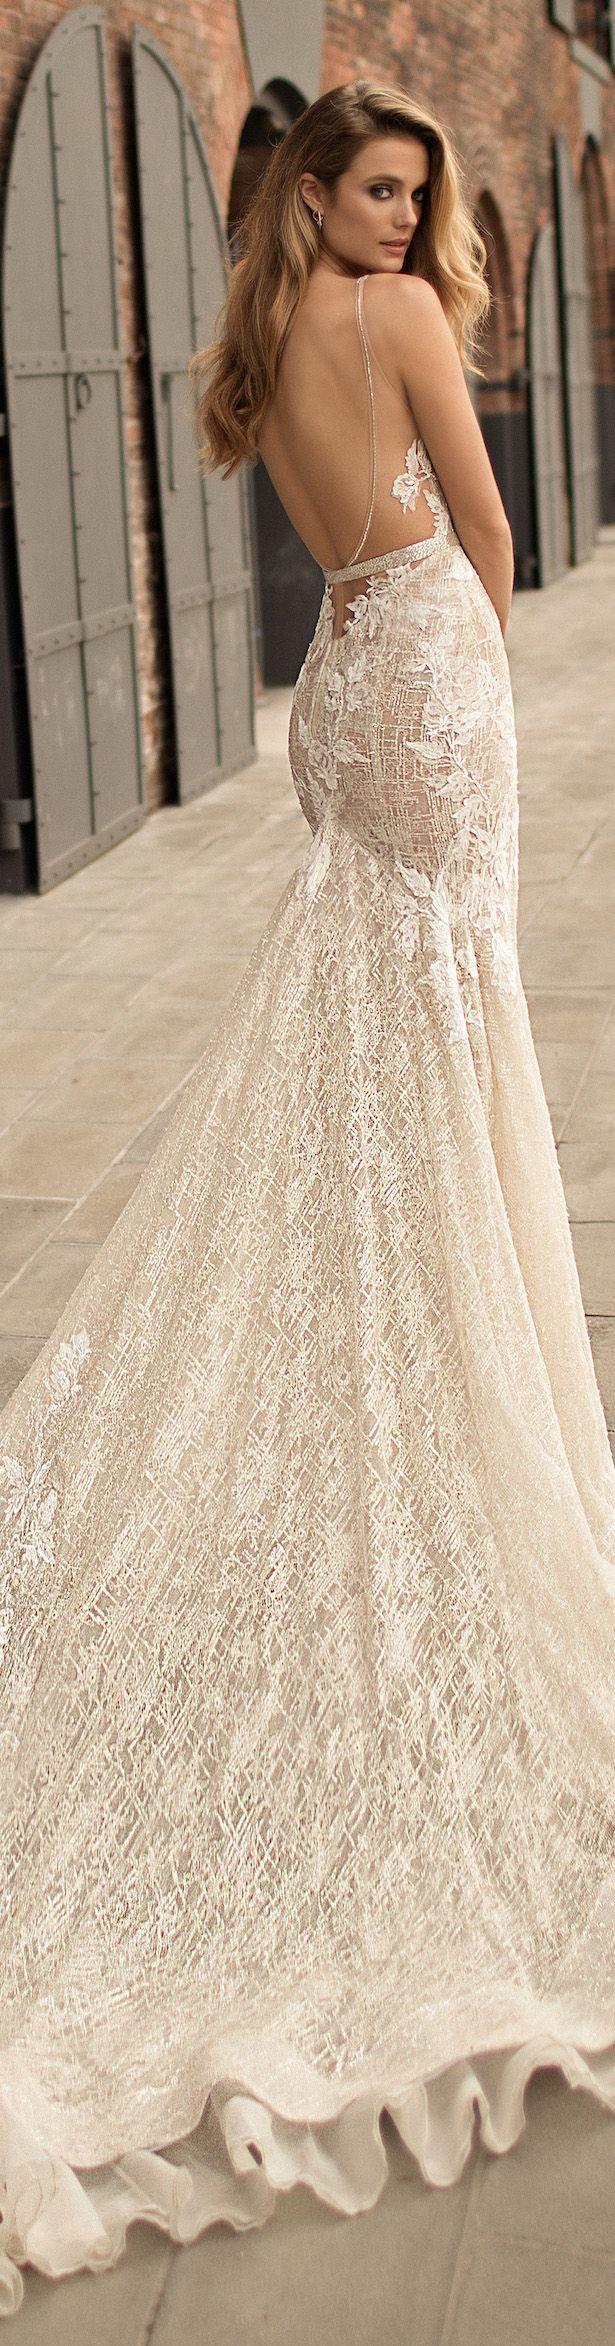 Berta wedding dress collection spring wedding dress